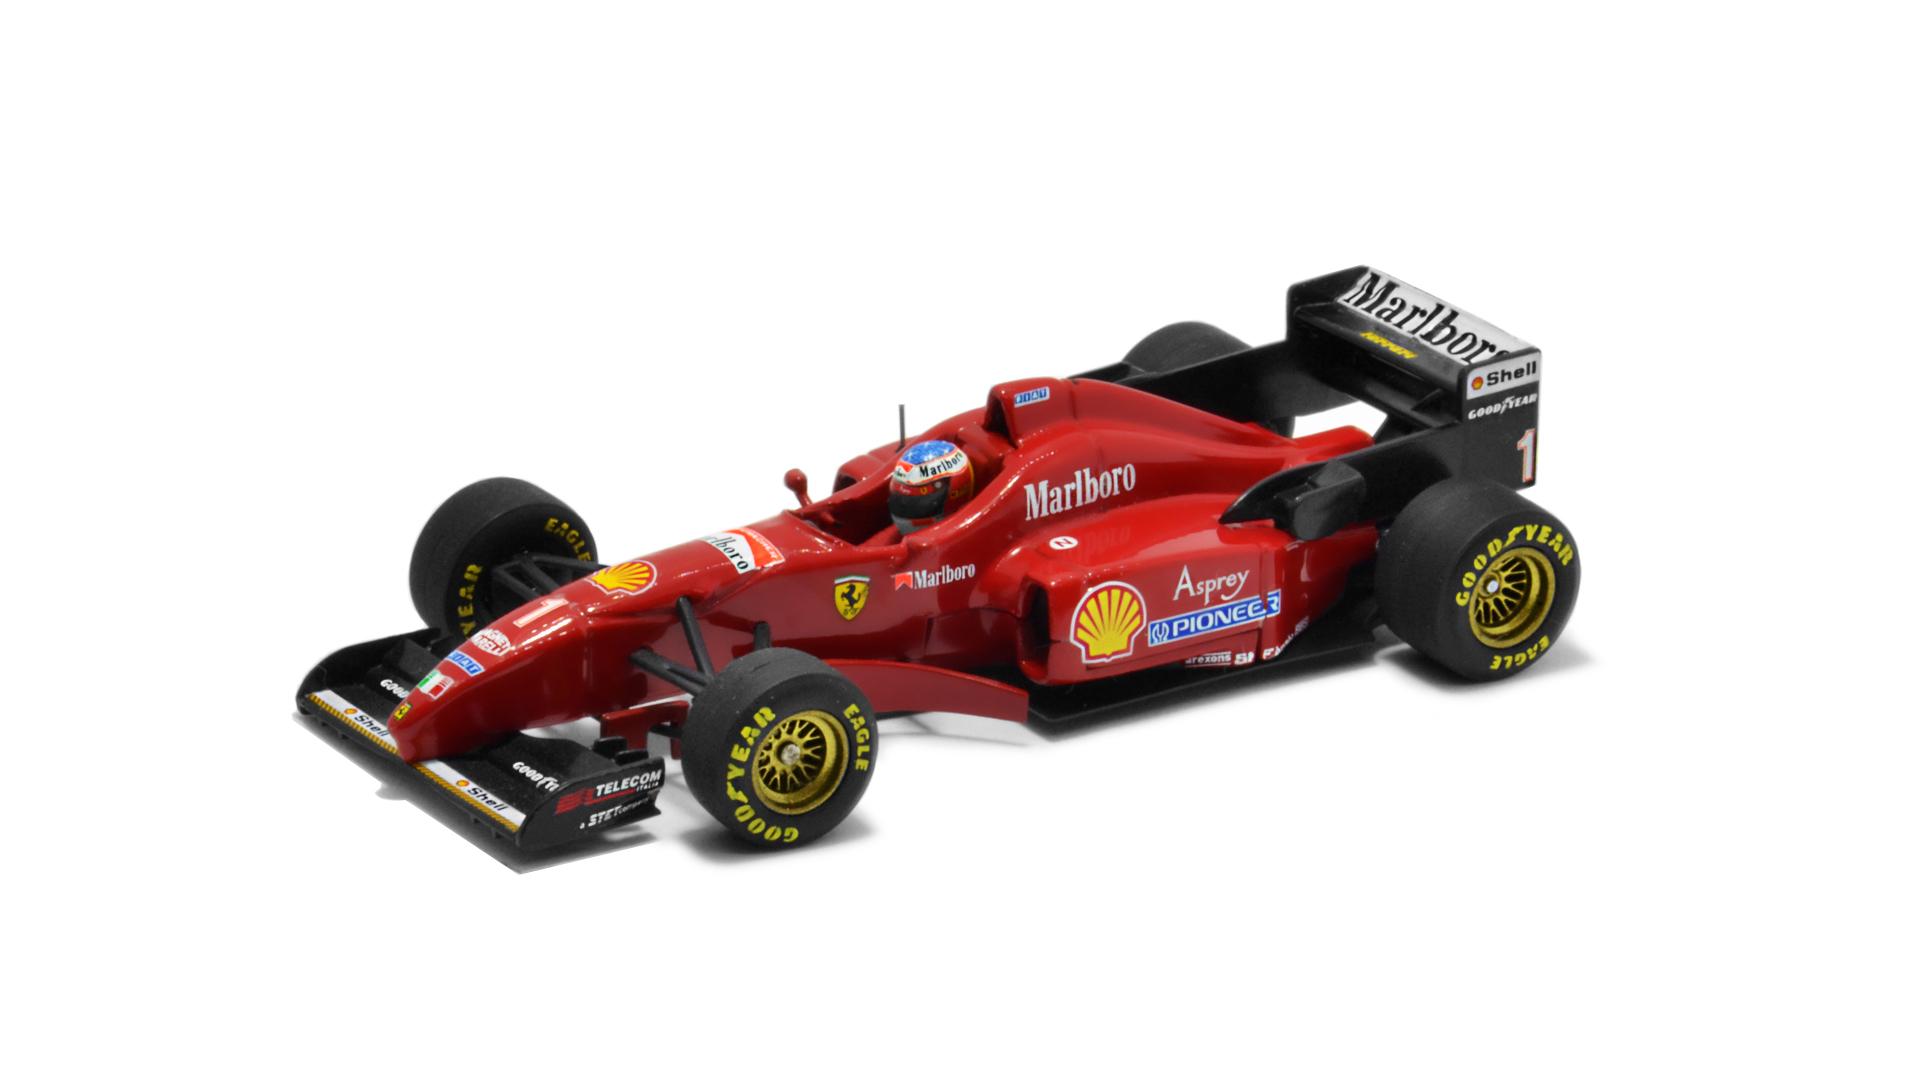 Év: 1996<br />Modell: F310<br />Gyártó: Minichamps<br />Pilóta: Michael Schumacher